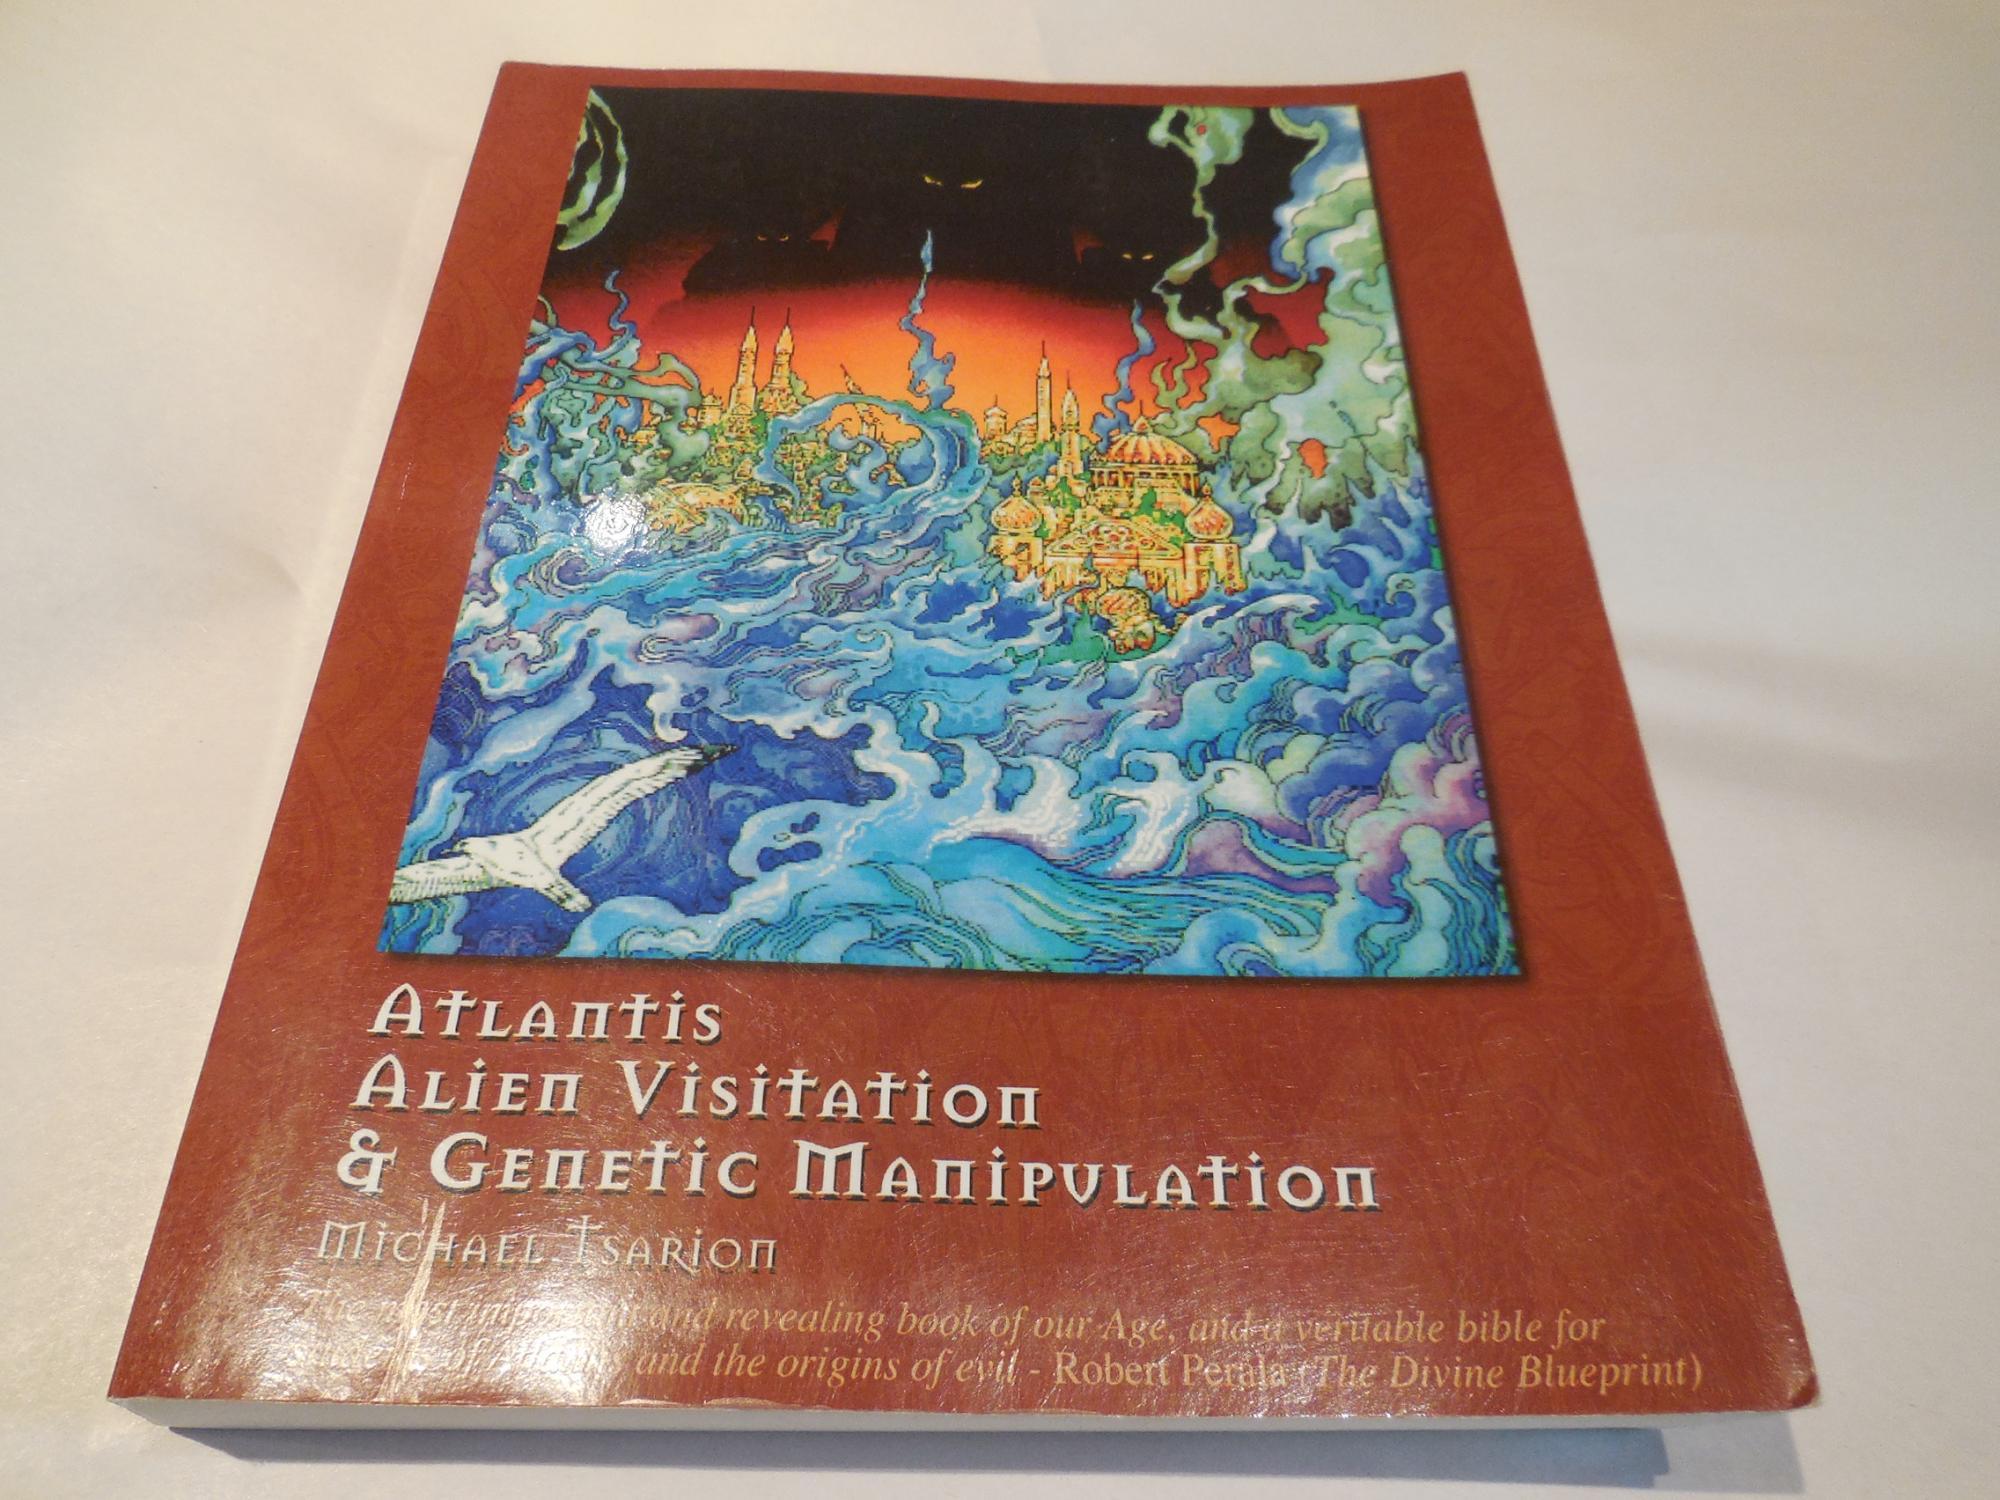 Atlantis alien visitation genetic manipulation by michael tsarion atlantis alien visitation genetic manipulation by michael tsarion abebooks malvernweather Images